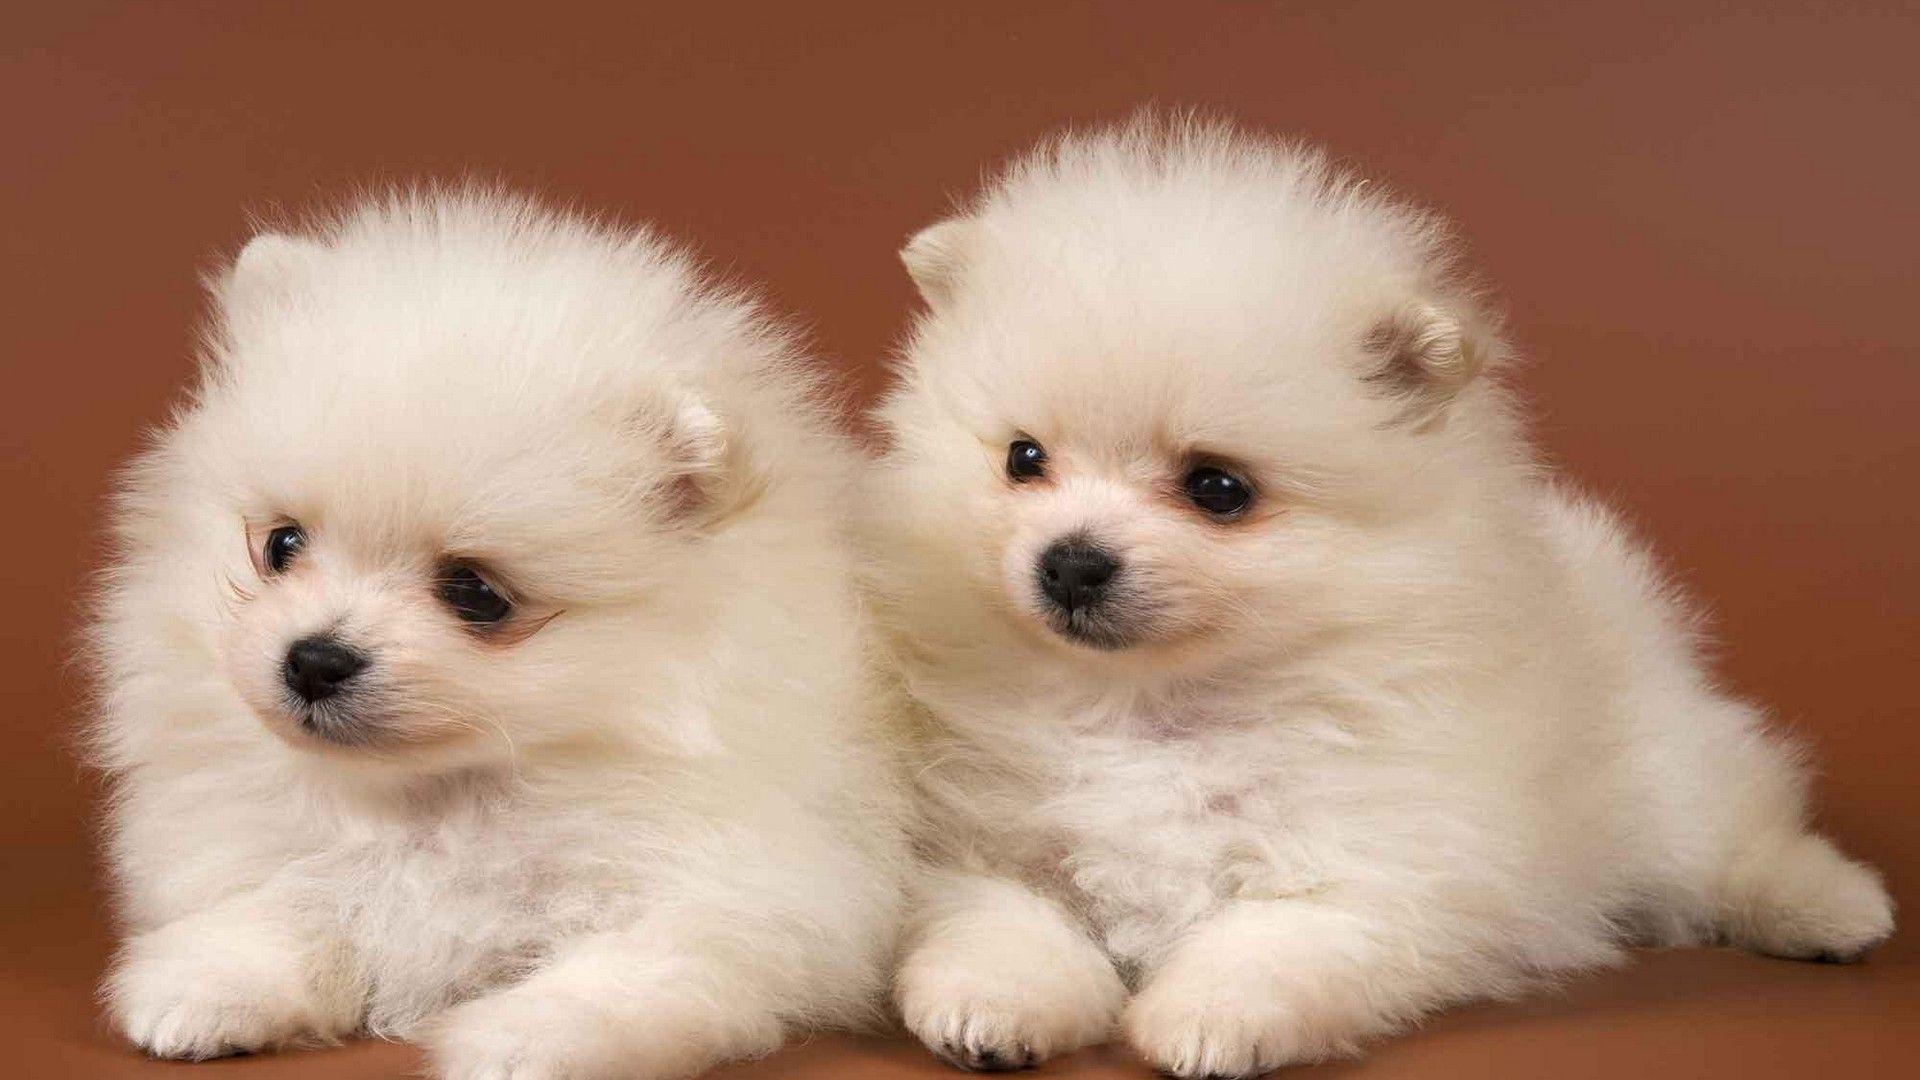 Cute Puppies Wallpaper Hd 2021 Live Wallpaper Hd Cute Puppy Wallpaper Cute Dog Beds Pomeranian Puppy